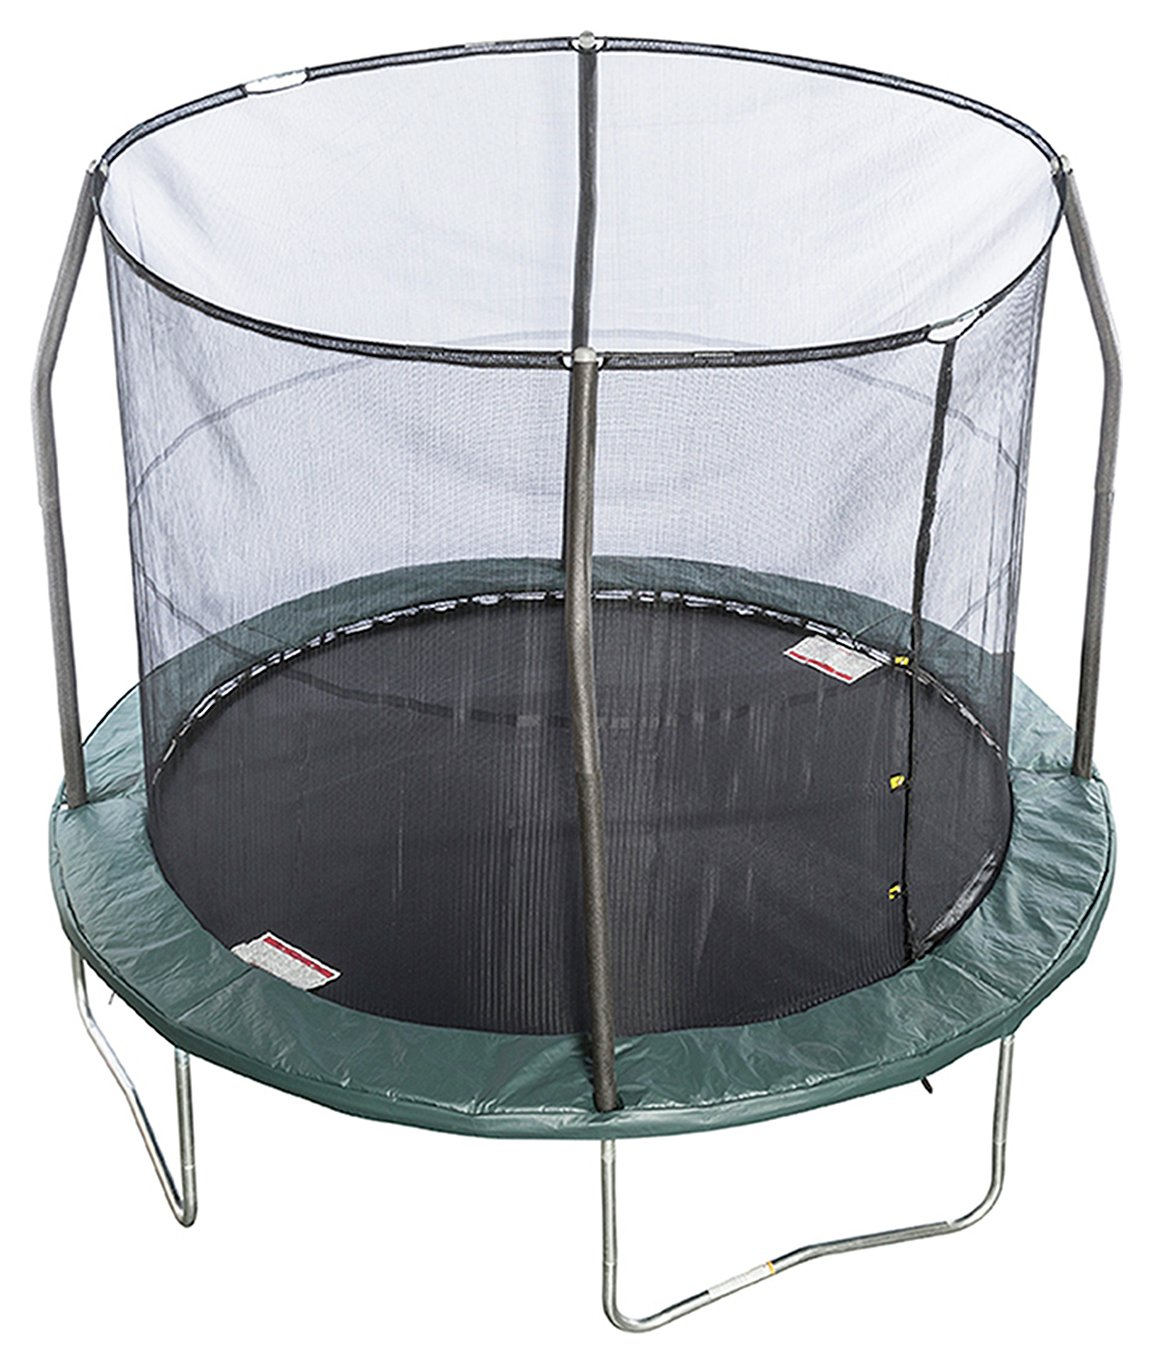 Image of Jumpking - 10ft Premium - Trampoline